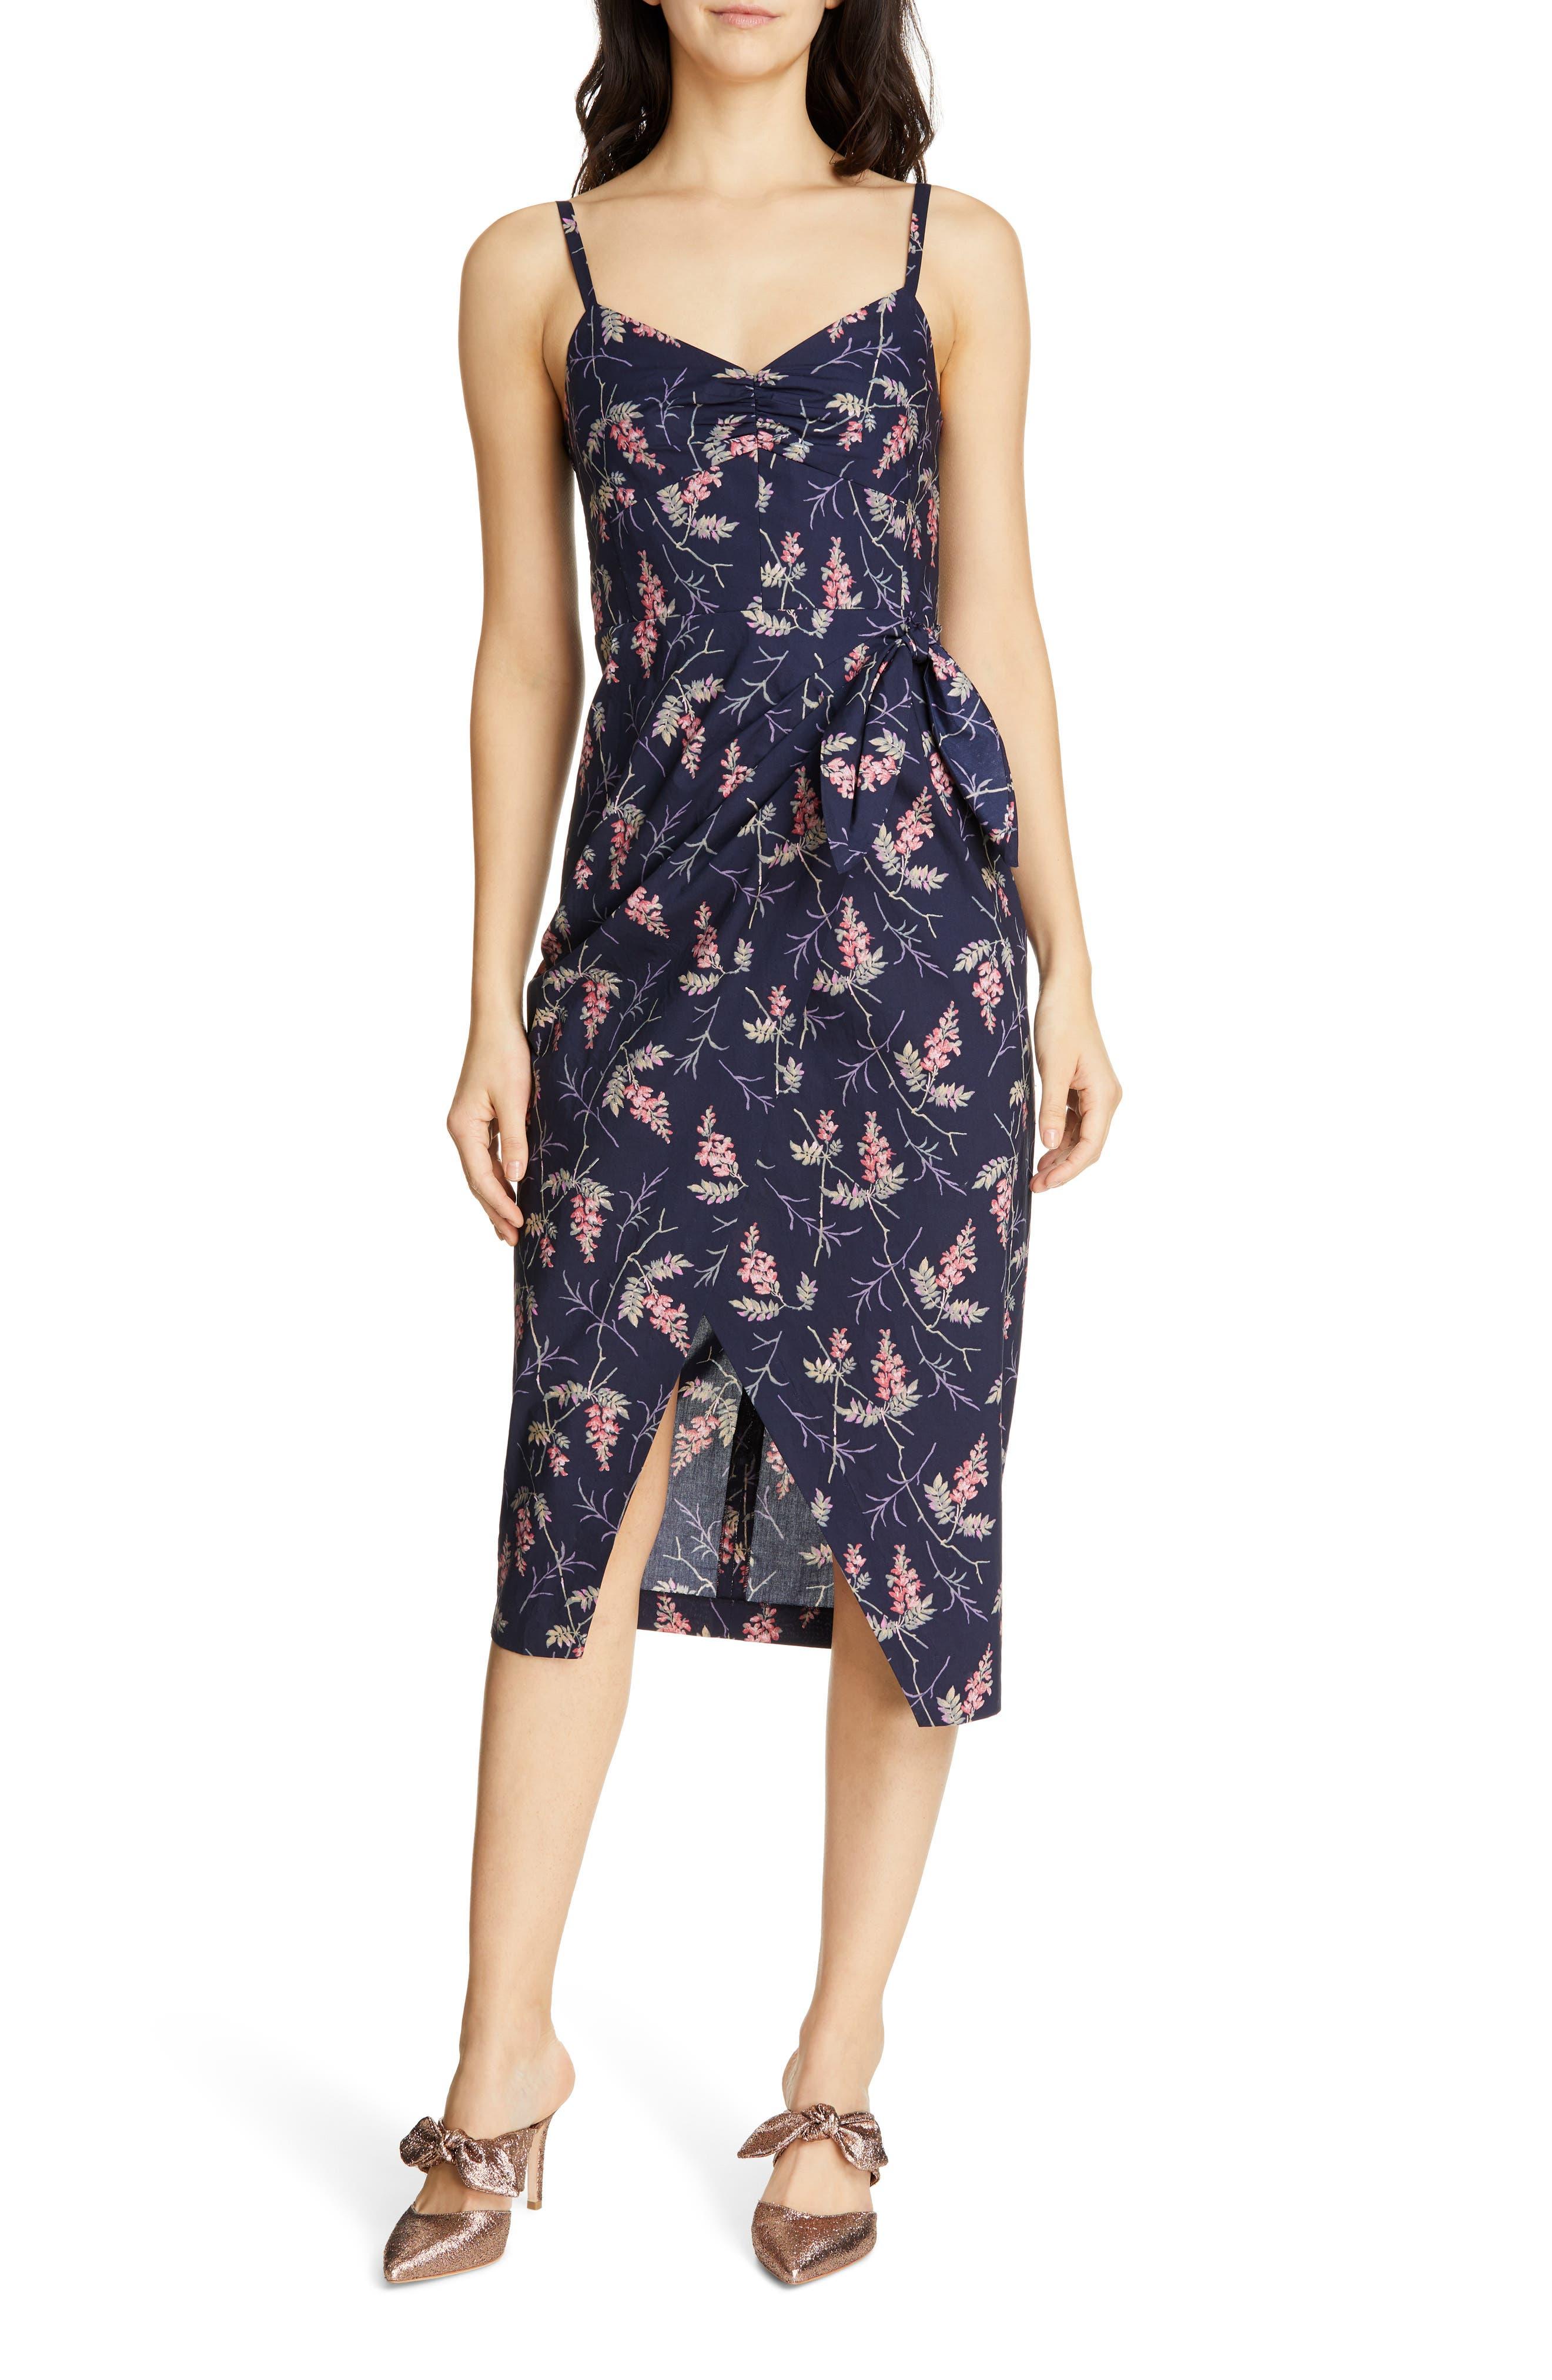 REBECCA TAYLOR, Ivie Floral Sleeveless Cotton Midi Sundress, Main thumbnail 1, color, NAVY COMBO